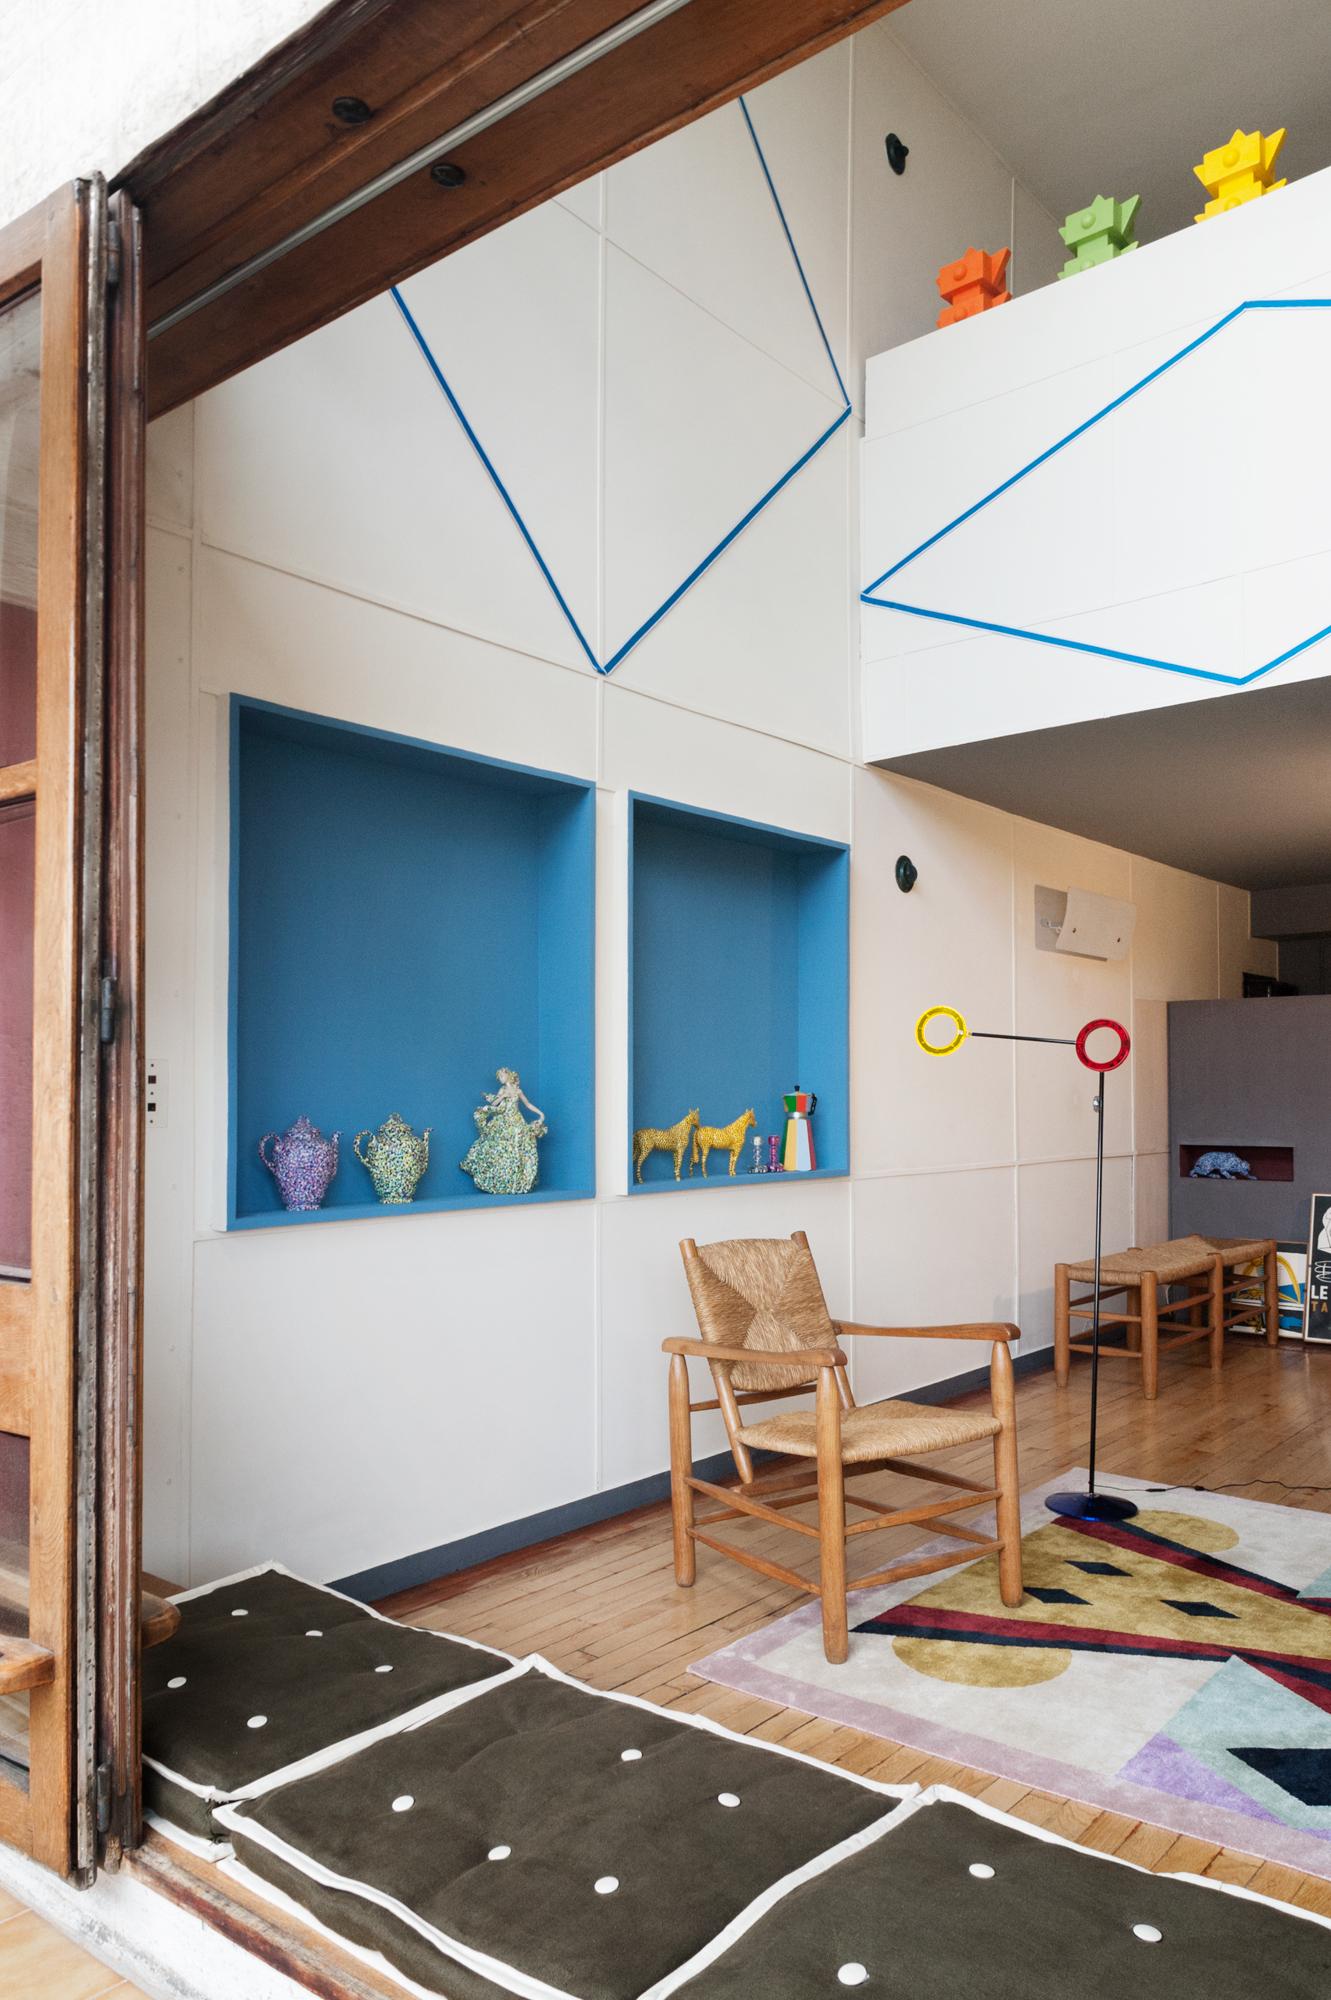 alessandro mendini at corbusier 39 s unit d 39 habitation tlmagazine. Black Bedroom Furniture Sets. Home Design Ideas